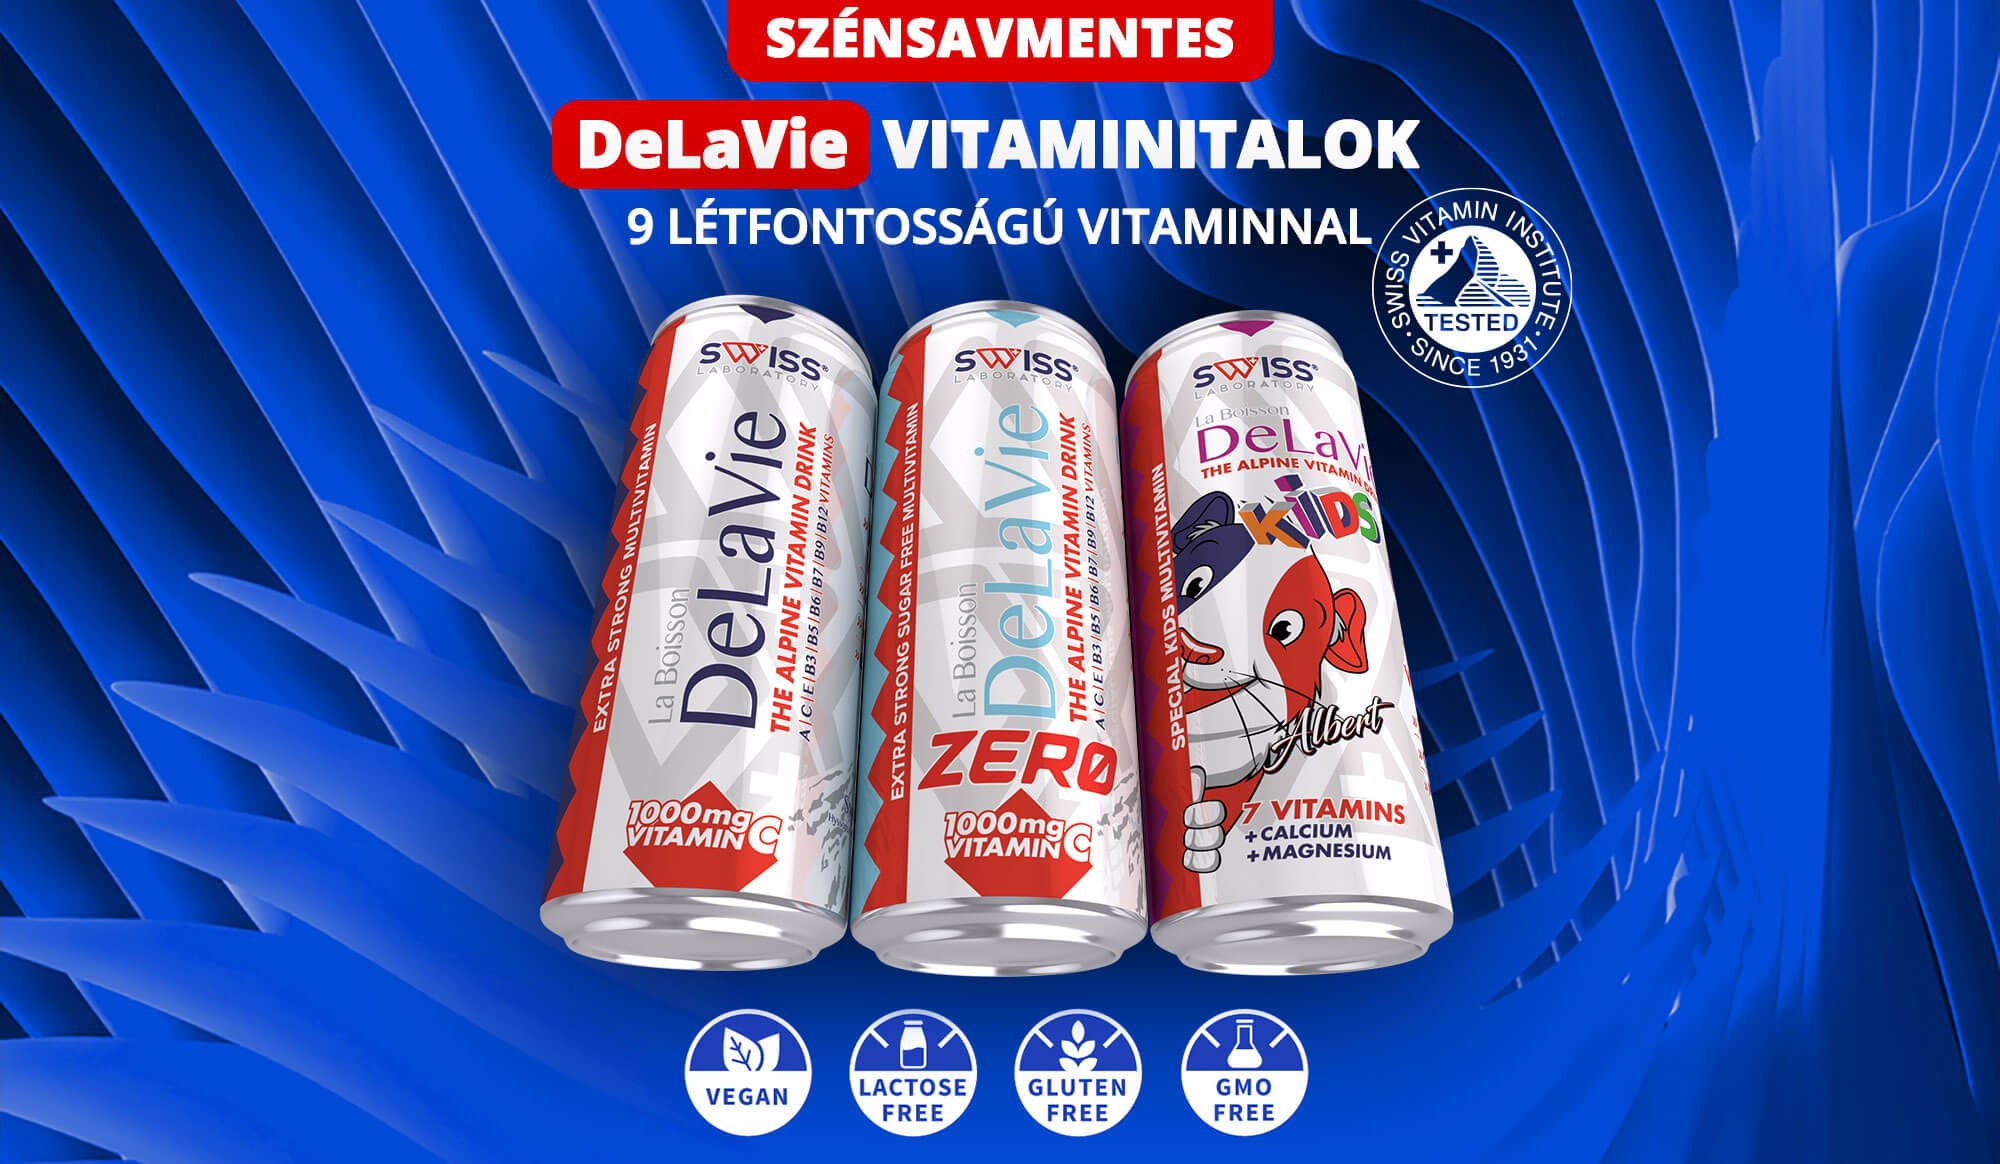 Delavie szénsavmentes vitaminitalok